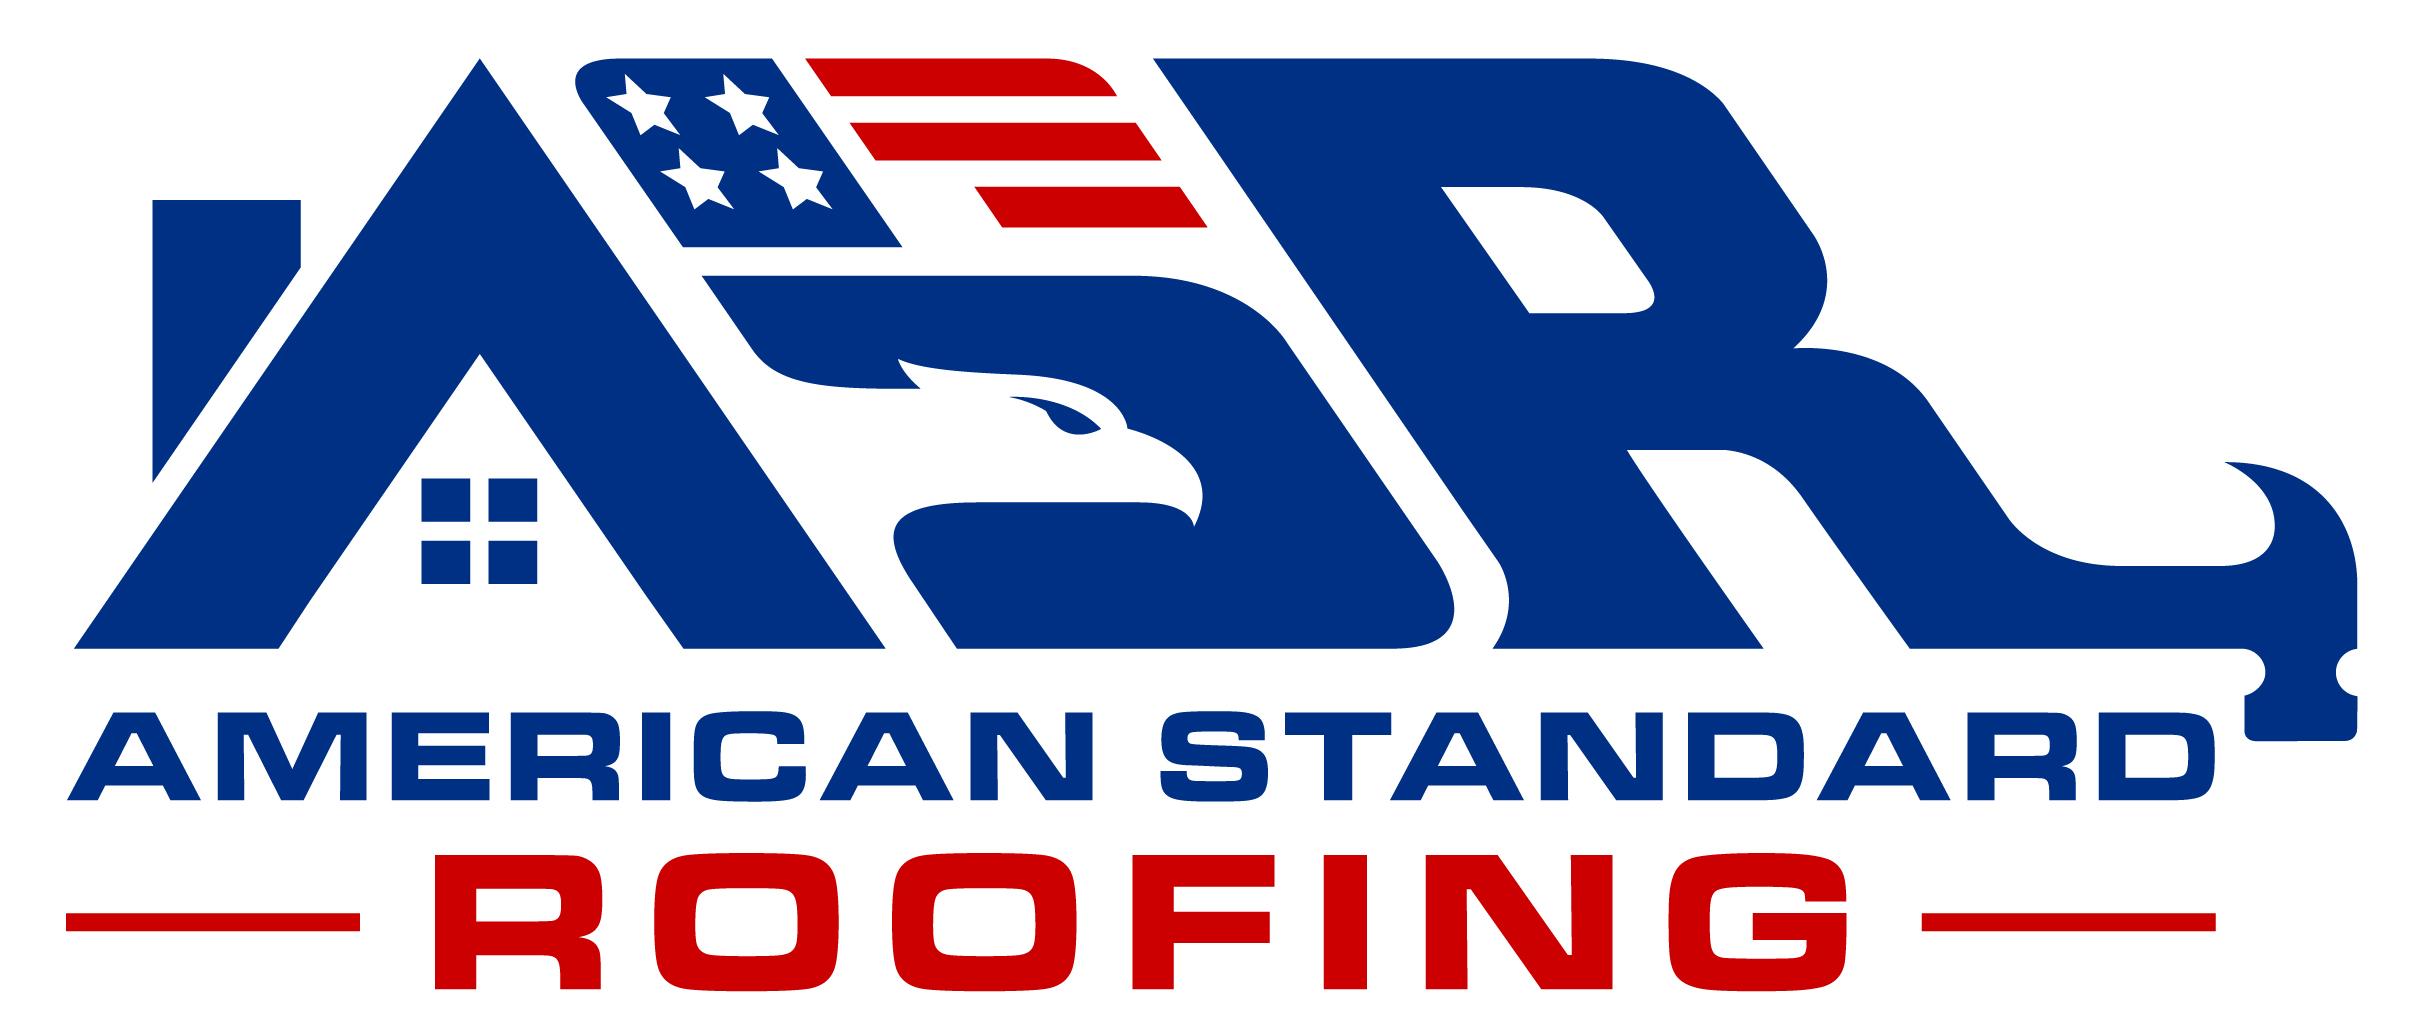 American Standard Roofing in Southfield, MI 48034 | Citysearch